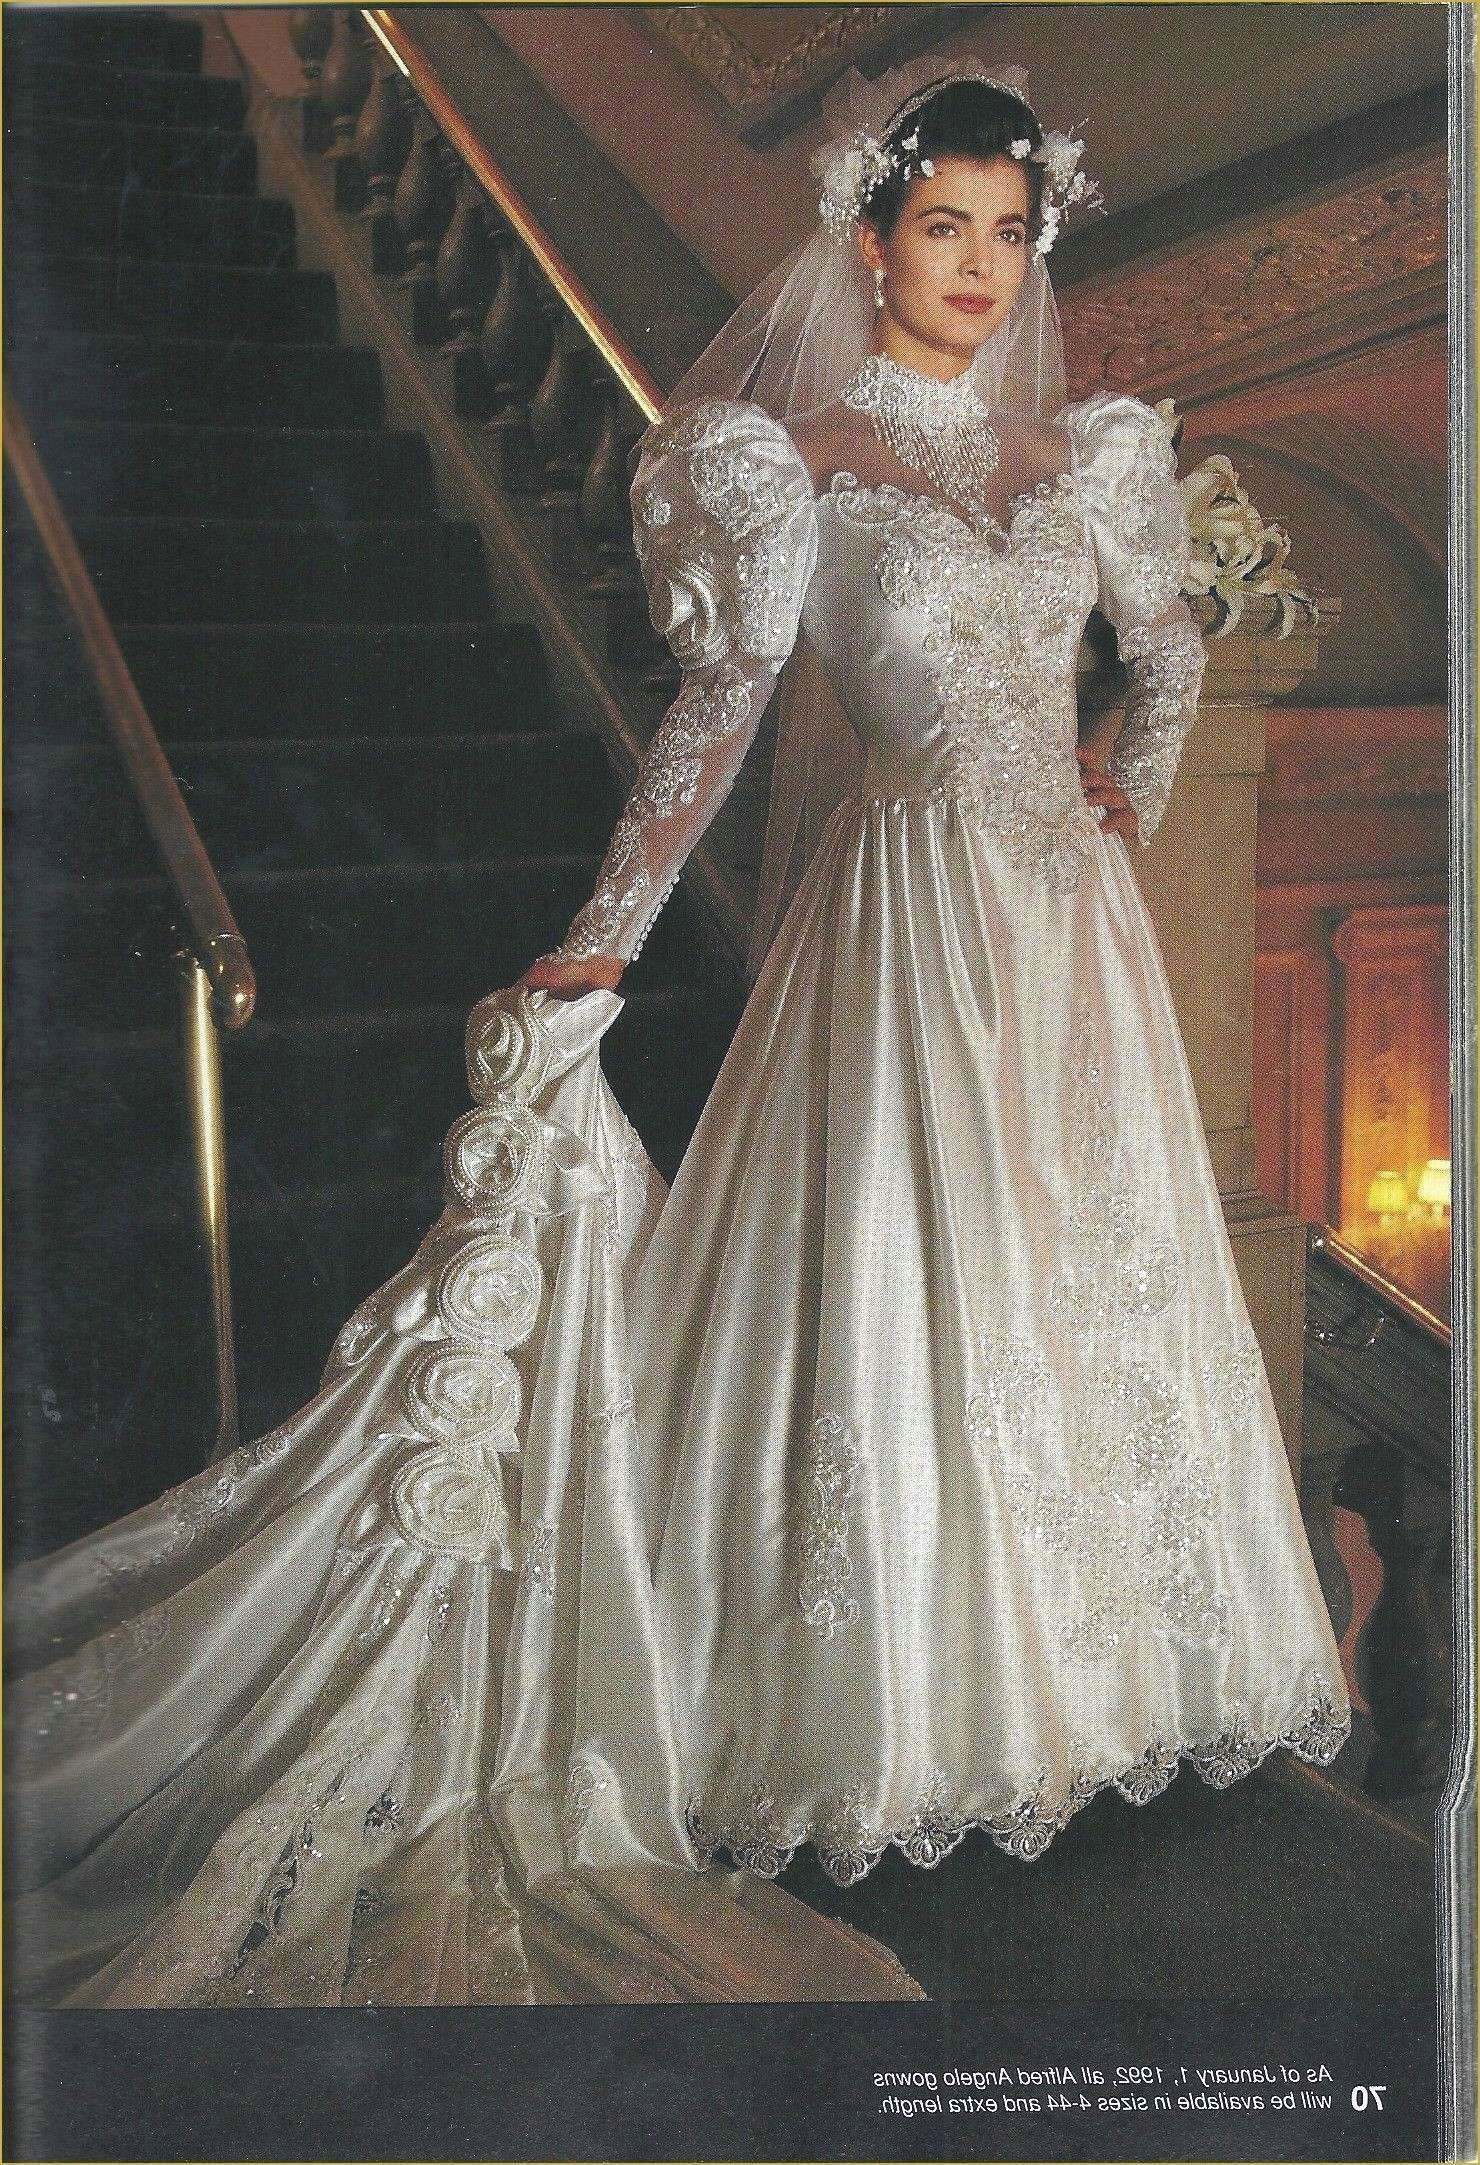 Women Sandals Boho Outfits Ideas Wedding Gowns Lace Wedding Dress Sleeves Wedding Dress Long Sleeve